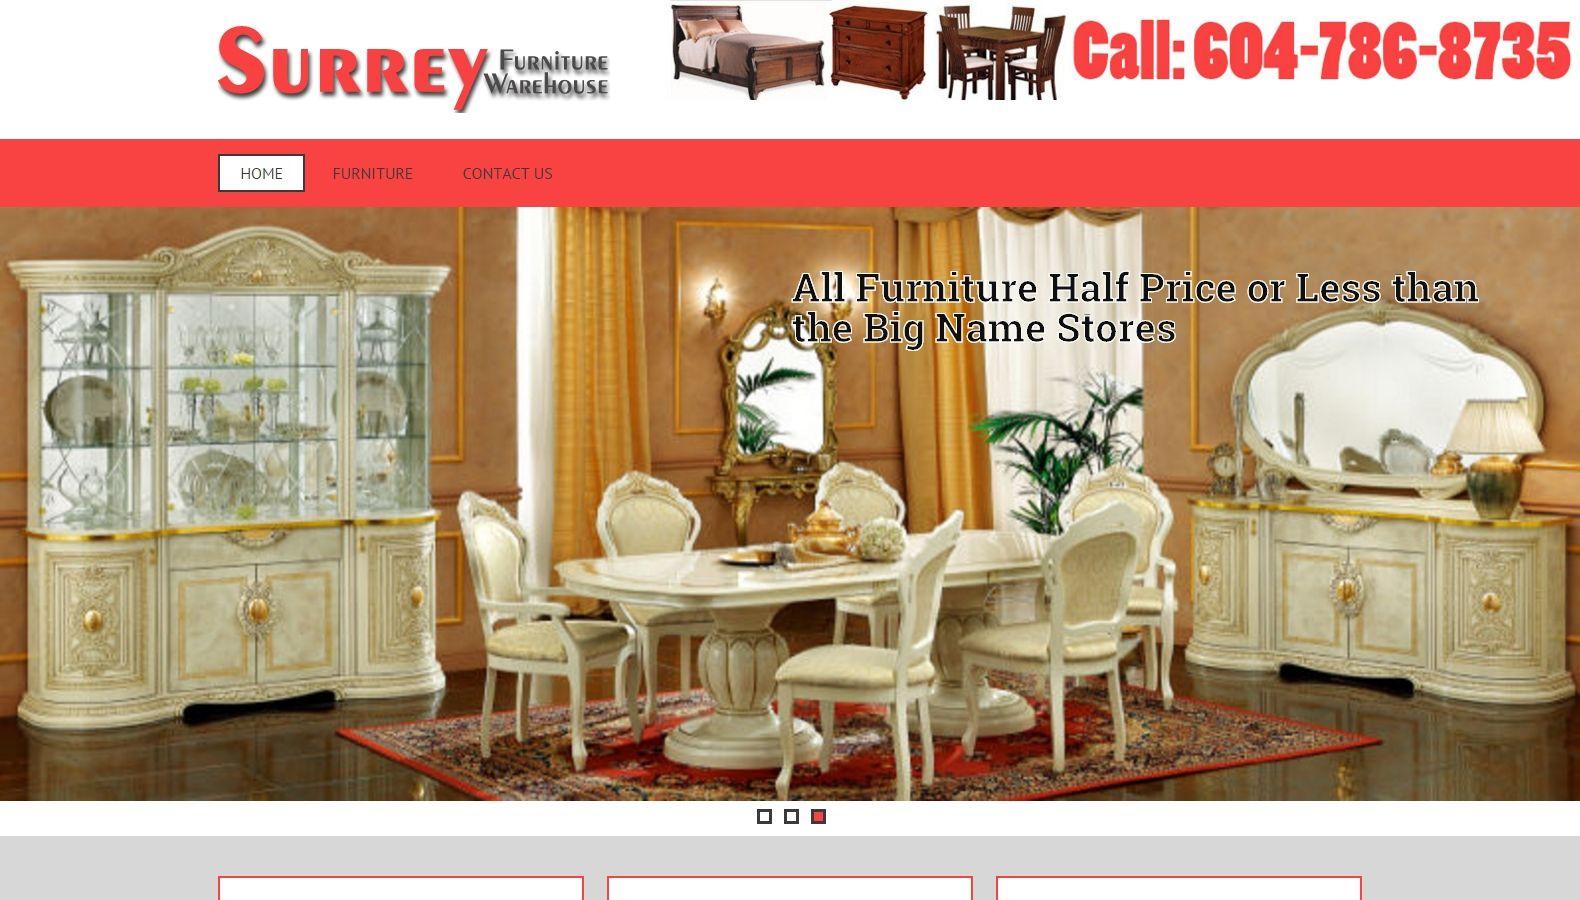 Surrey Furniture Warehouse Seo Web Design Services Surrey Bc Delta Website Designers